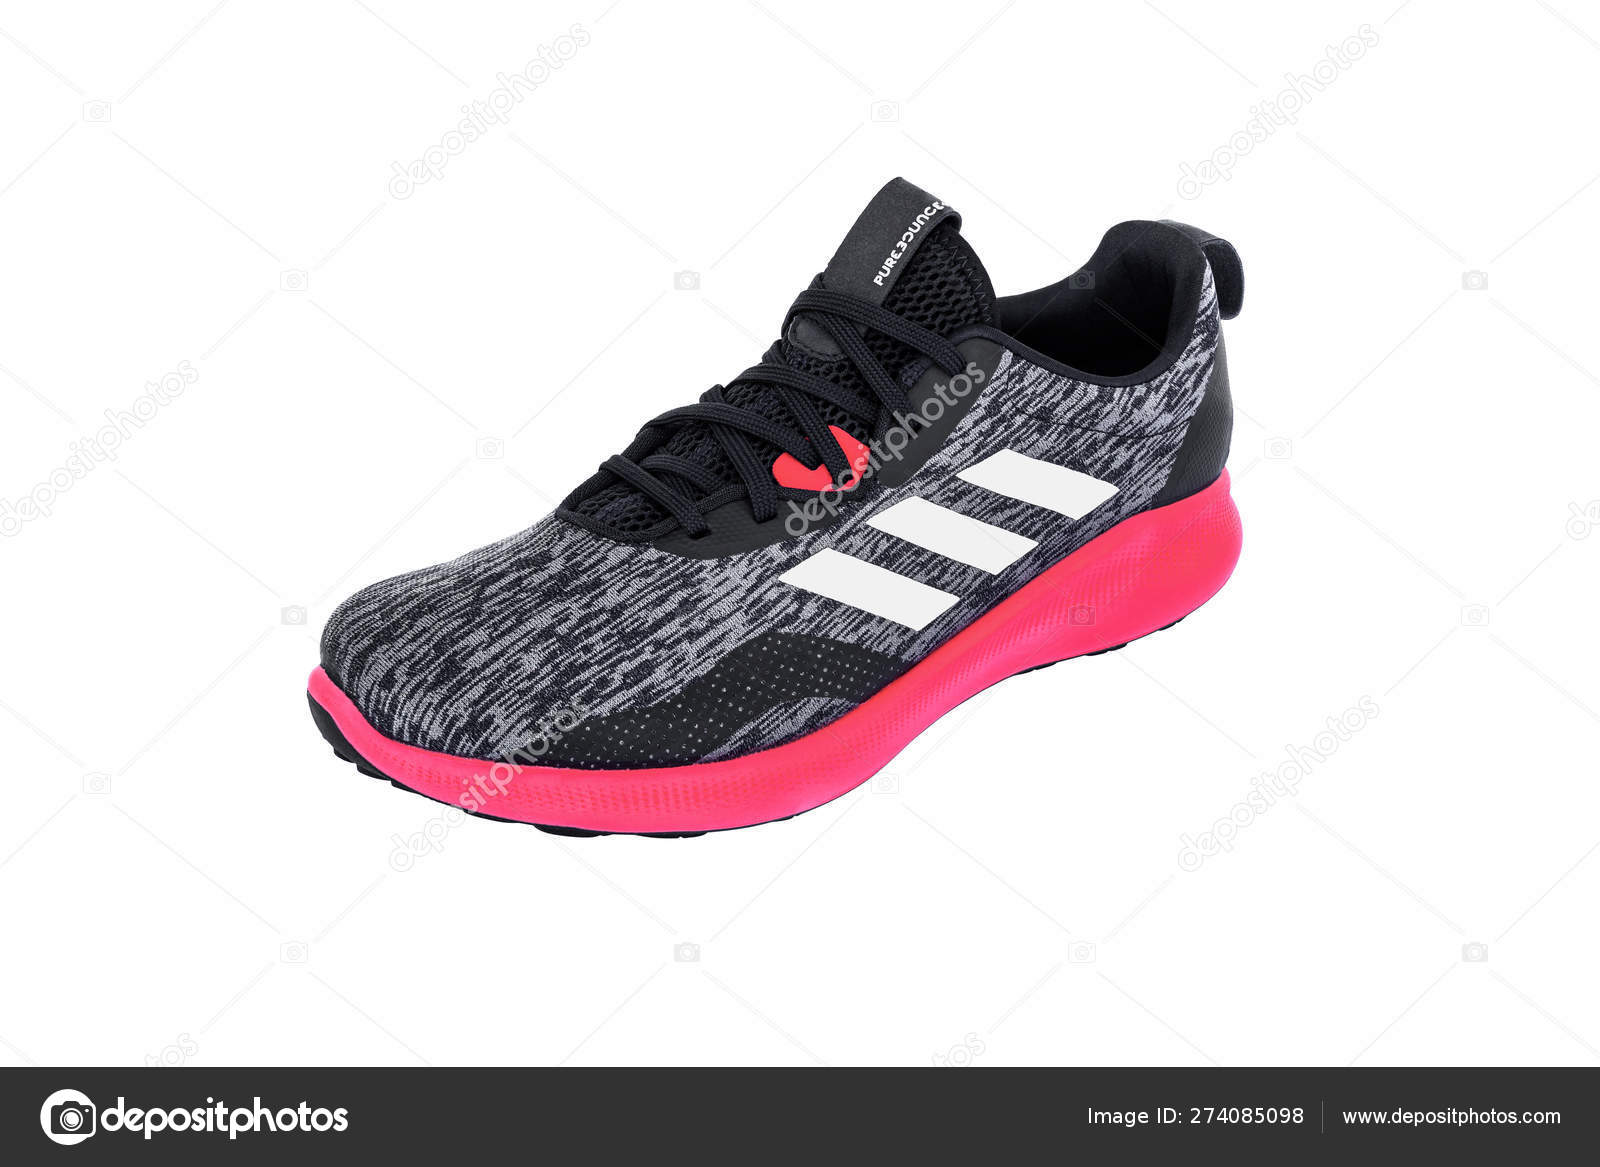 Adidas PUREBOUNCE STREET SHOES. 274085098